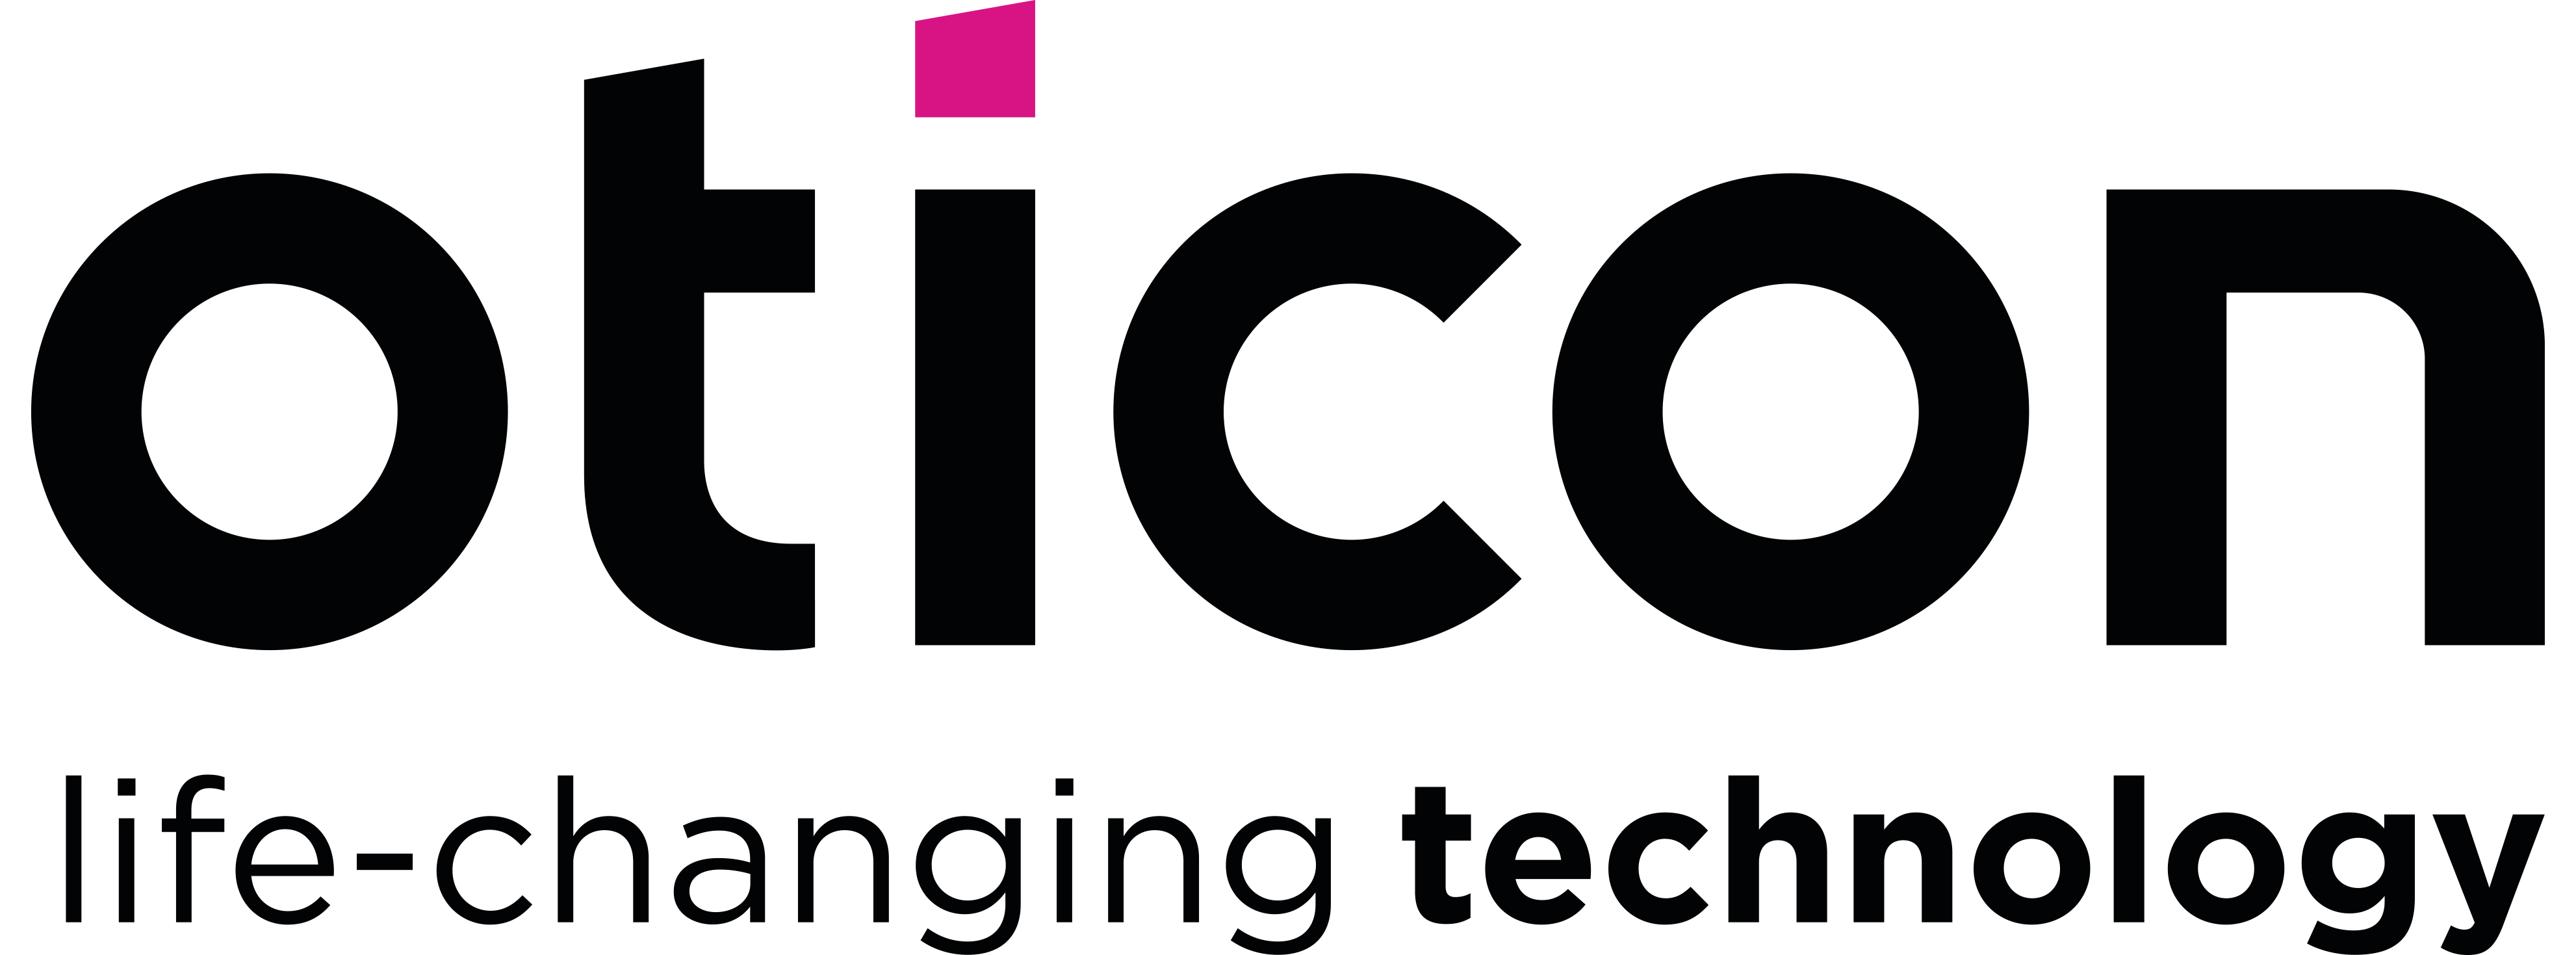 Oticon logotyp